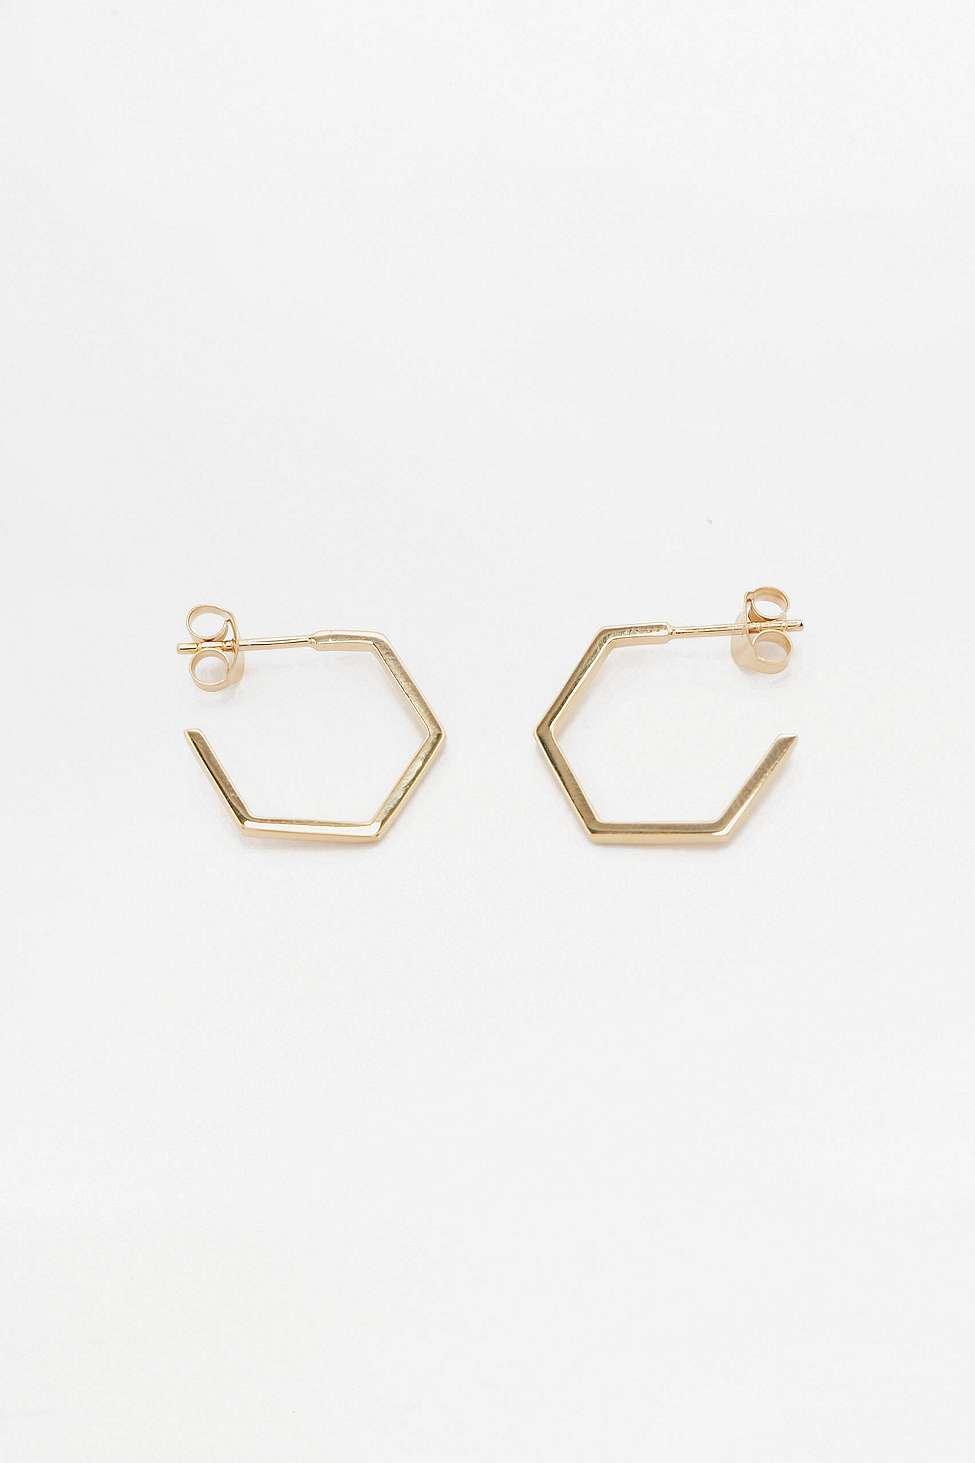 Rachel Jackson London Hexagon Gold Hoop Earrings